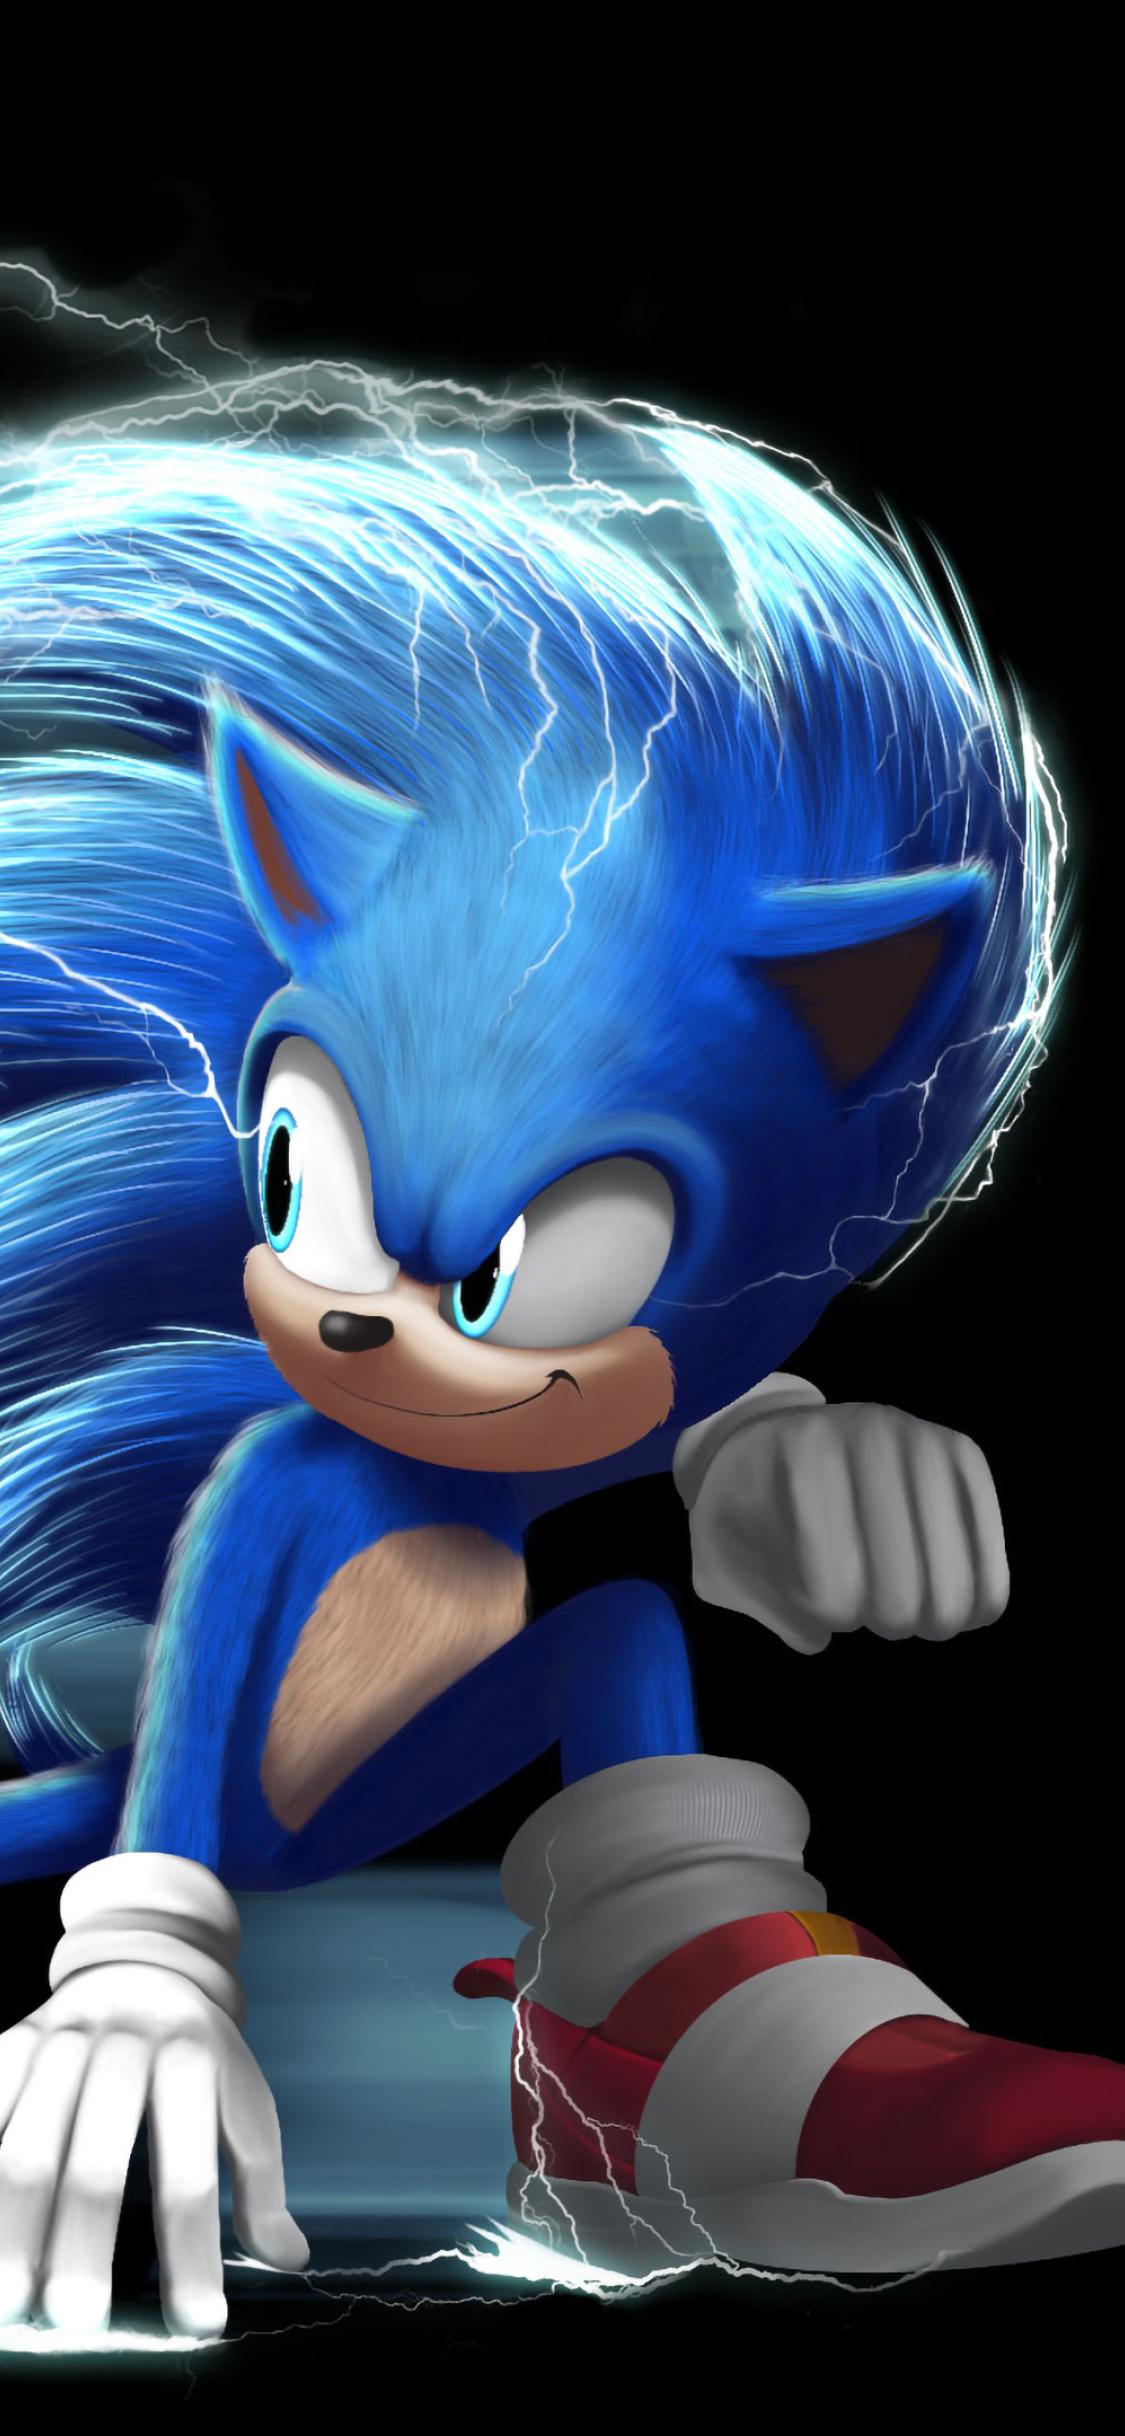 1125x2436 Sonic Movie 4K Iphone XS,Iphone 10,Iphone X ...